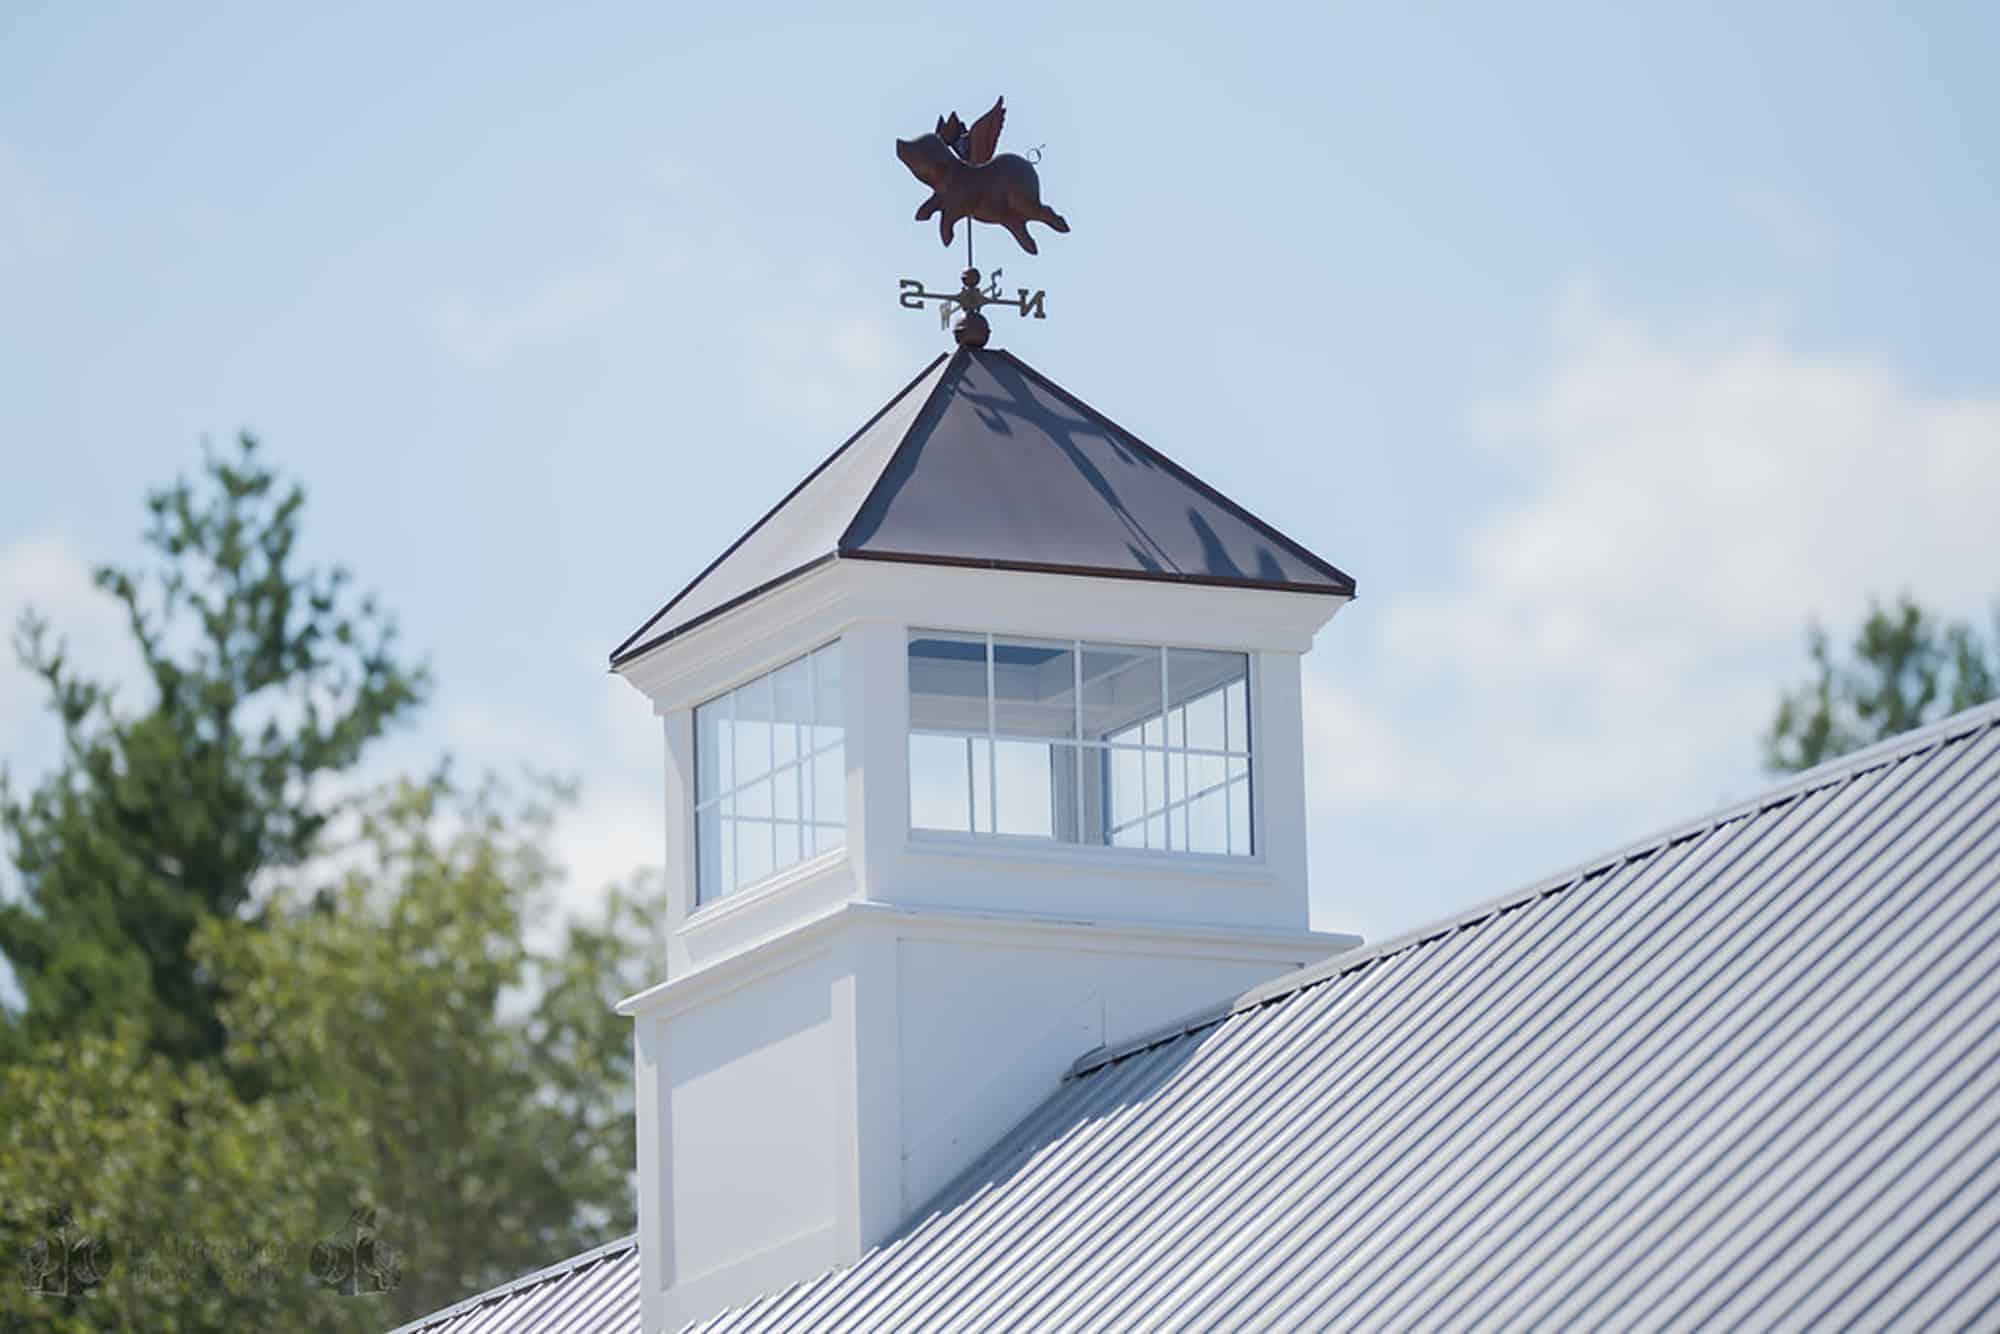 flying pig cupola weather vane horse stalls